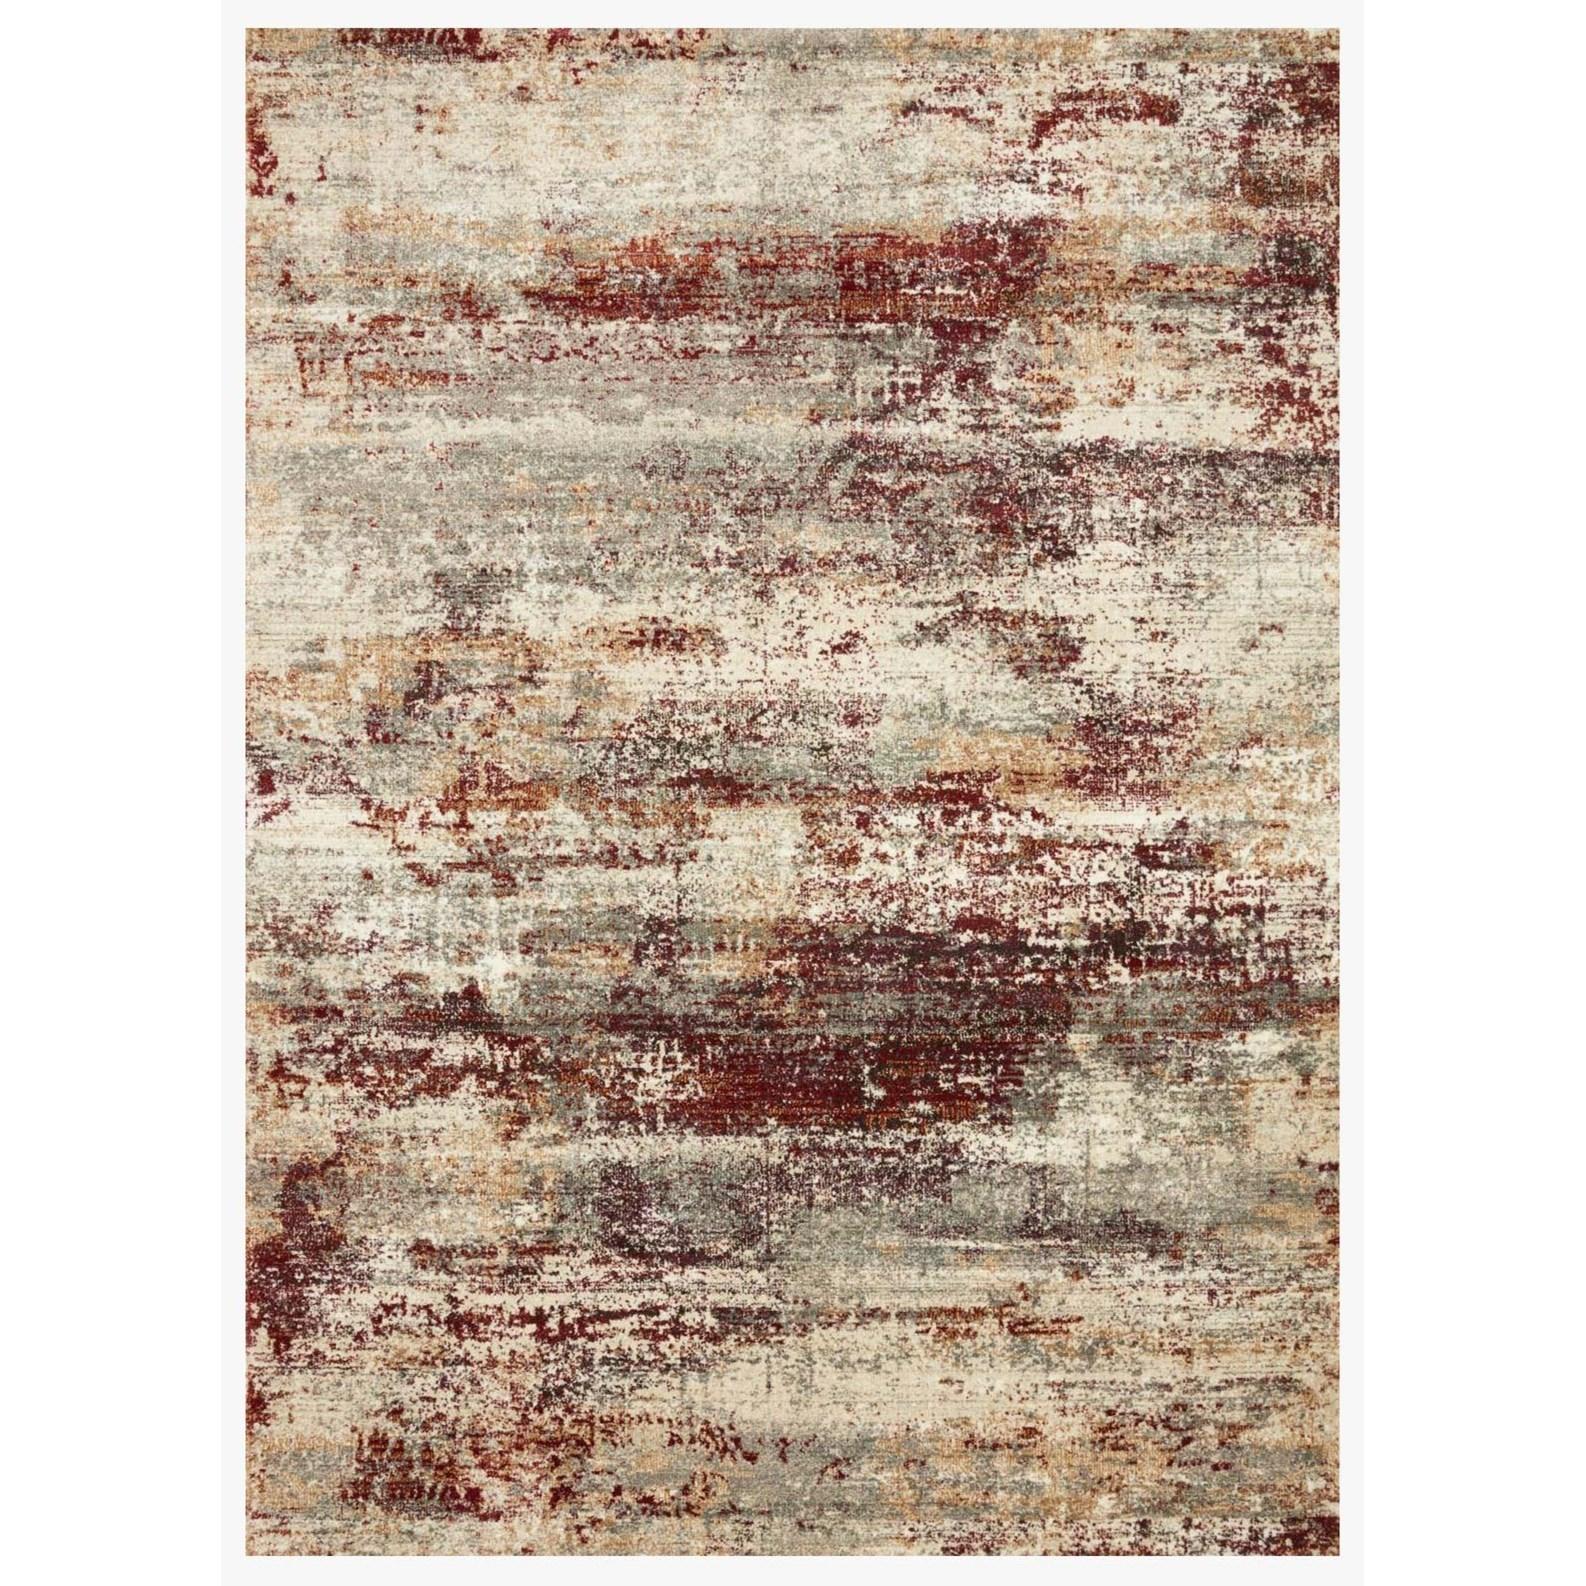 "Jasmine 3'7"" x 5'7"" Dove / Rust Rug by Loloi Rugs at Sprintz Furniture"